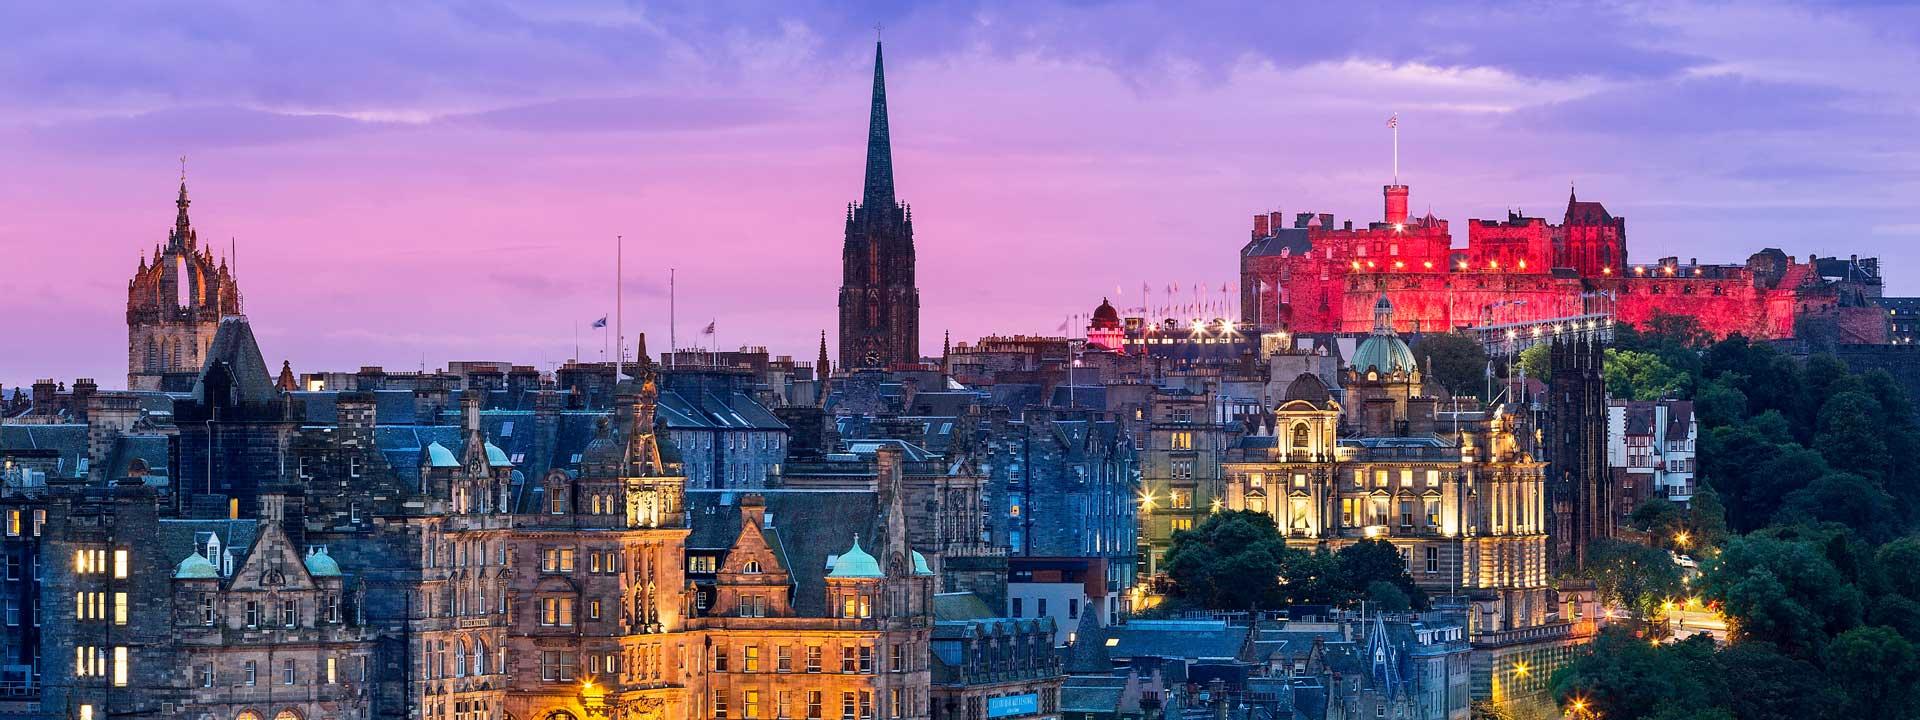 Edinburgh attractions lit up at night